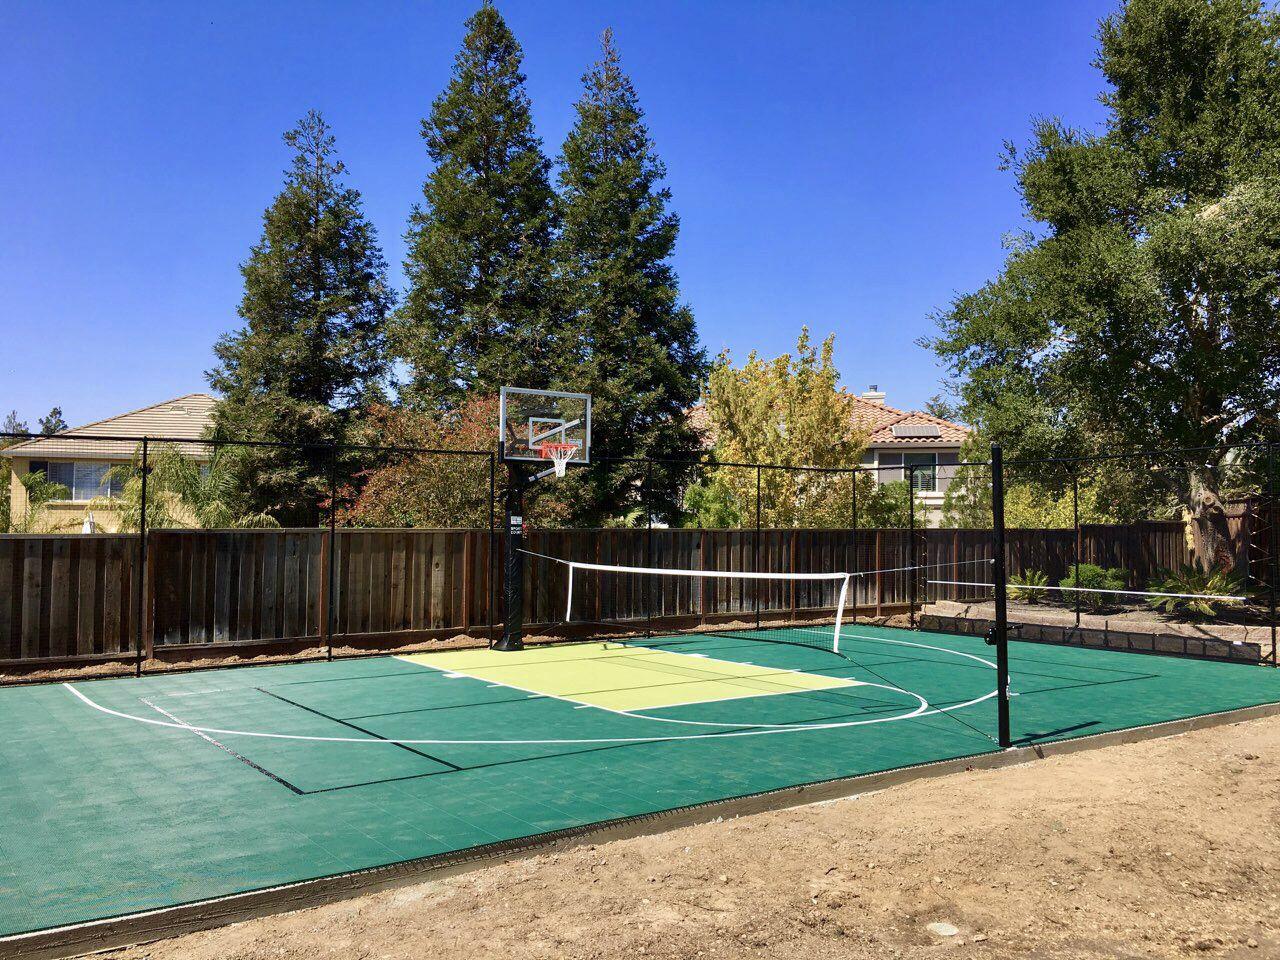 Backyard Sport Court Game Court Backyard Backyard Court Backyard Sports Mini backyard tennis court